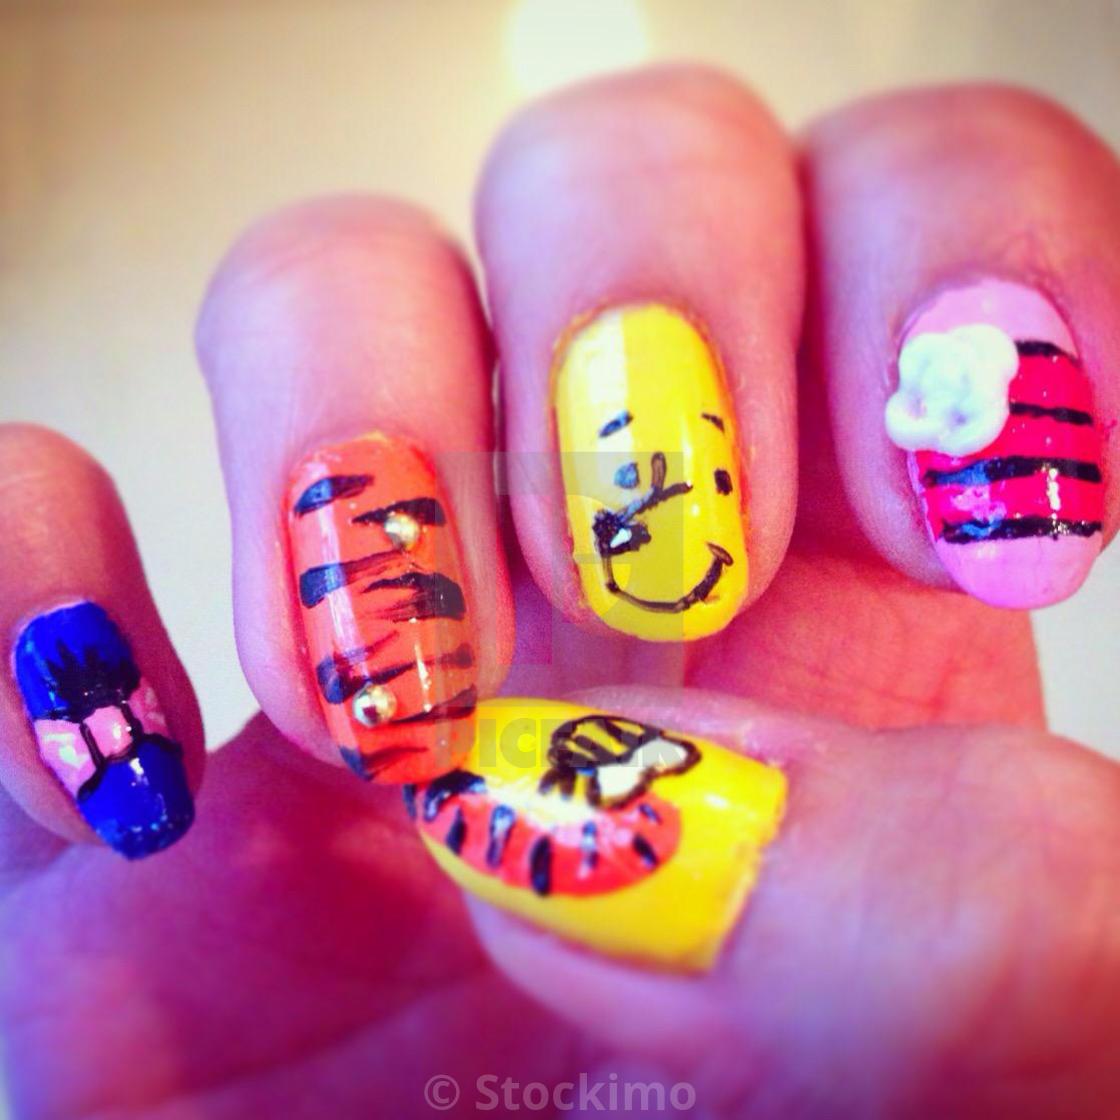 Winnie The Pooh Nail Art License For 3100 On Picfair